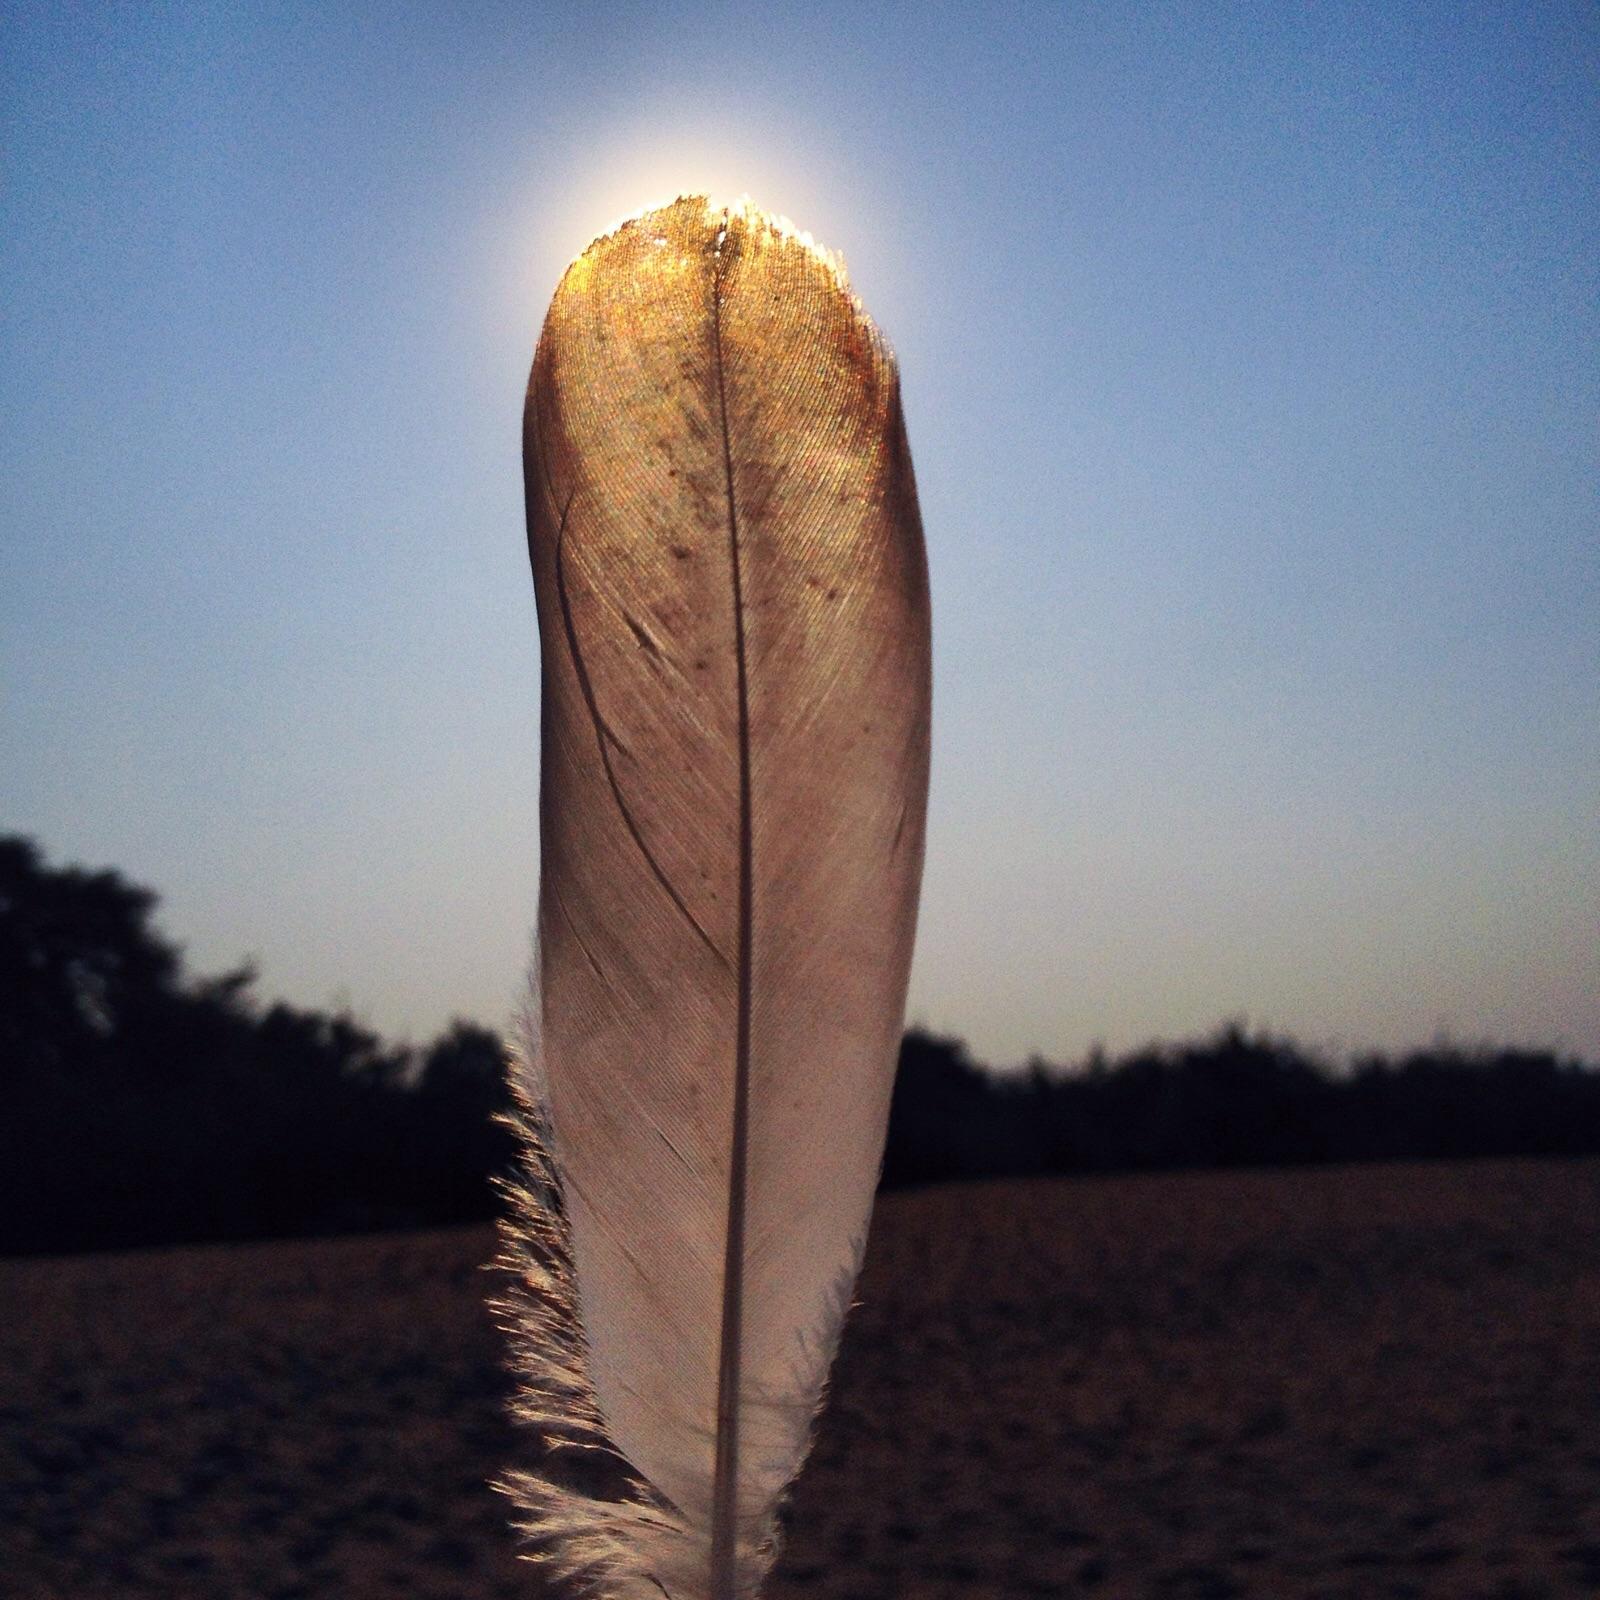 feather pexels-photo-89915